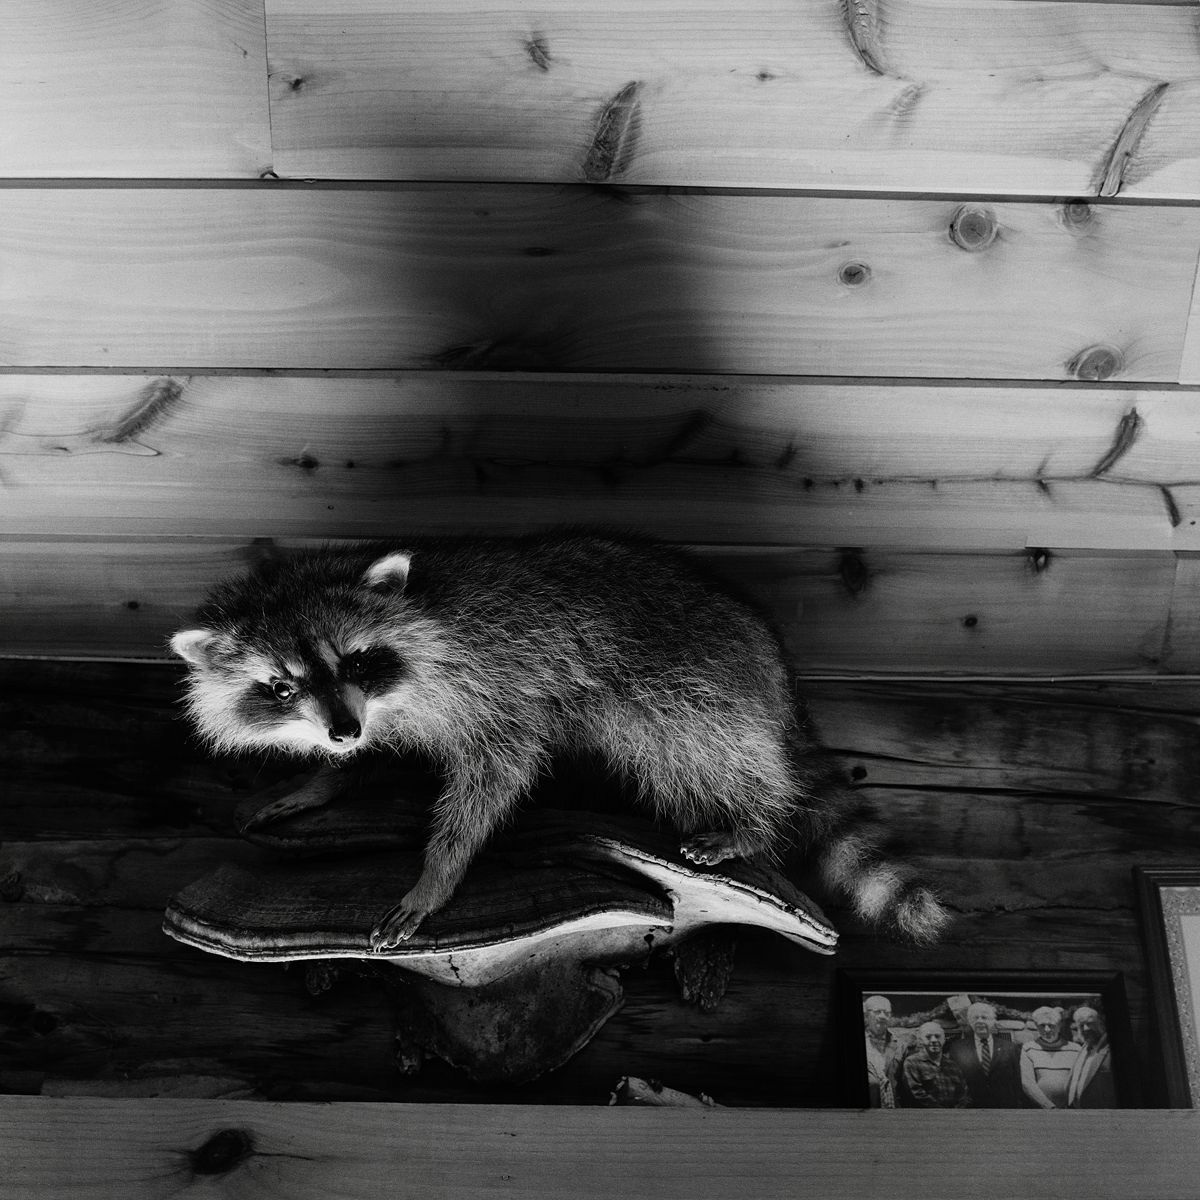 9. Raccoon and Group Portrait, Rod and Game Club, Saranac Lake, NY. 2000. Toned Gelatin Silver Print.